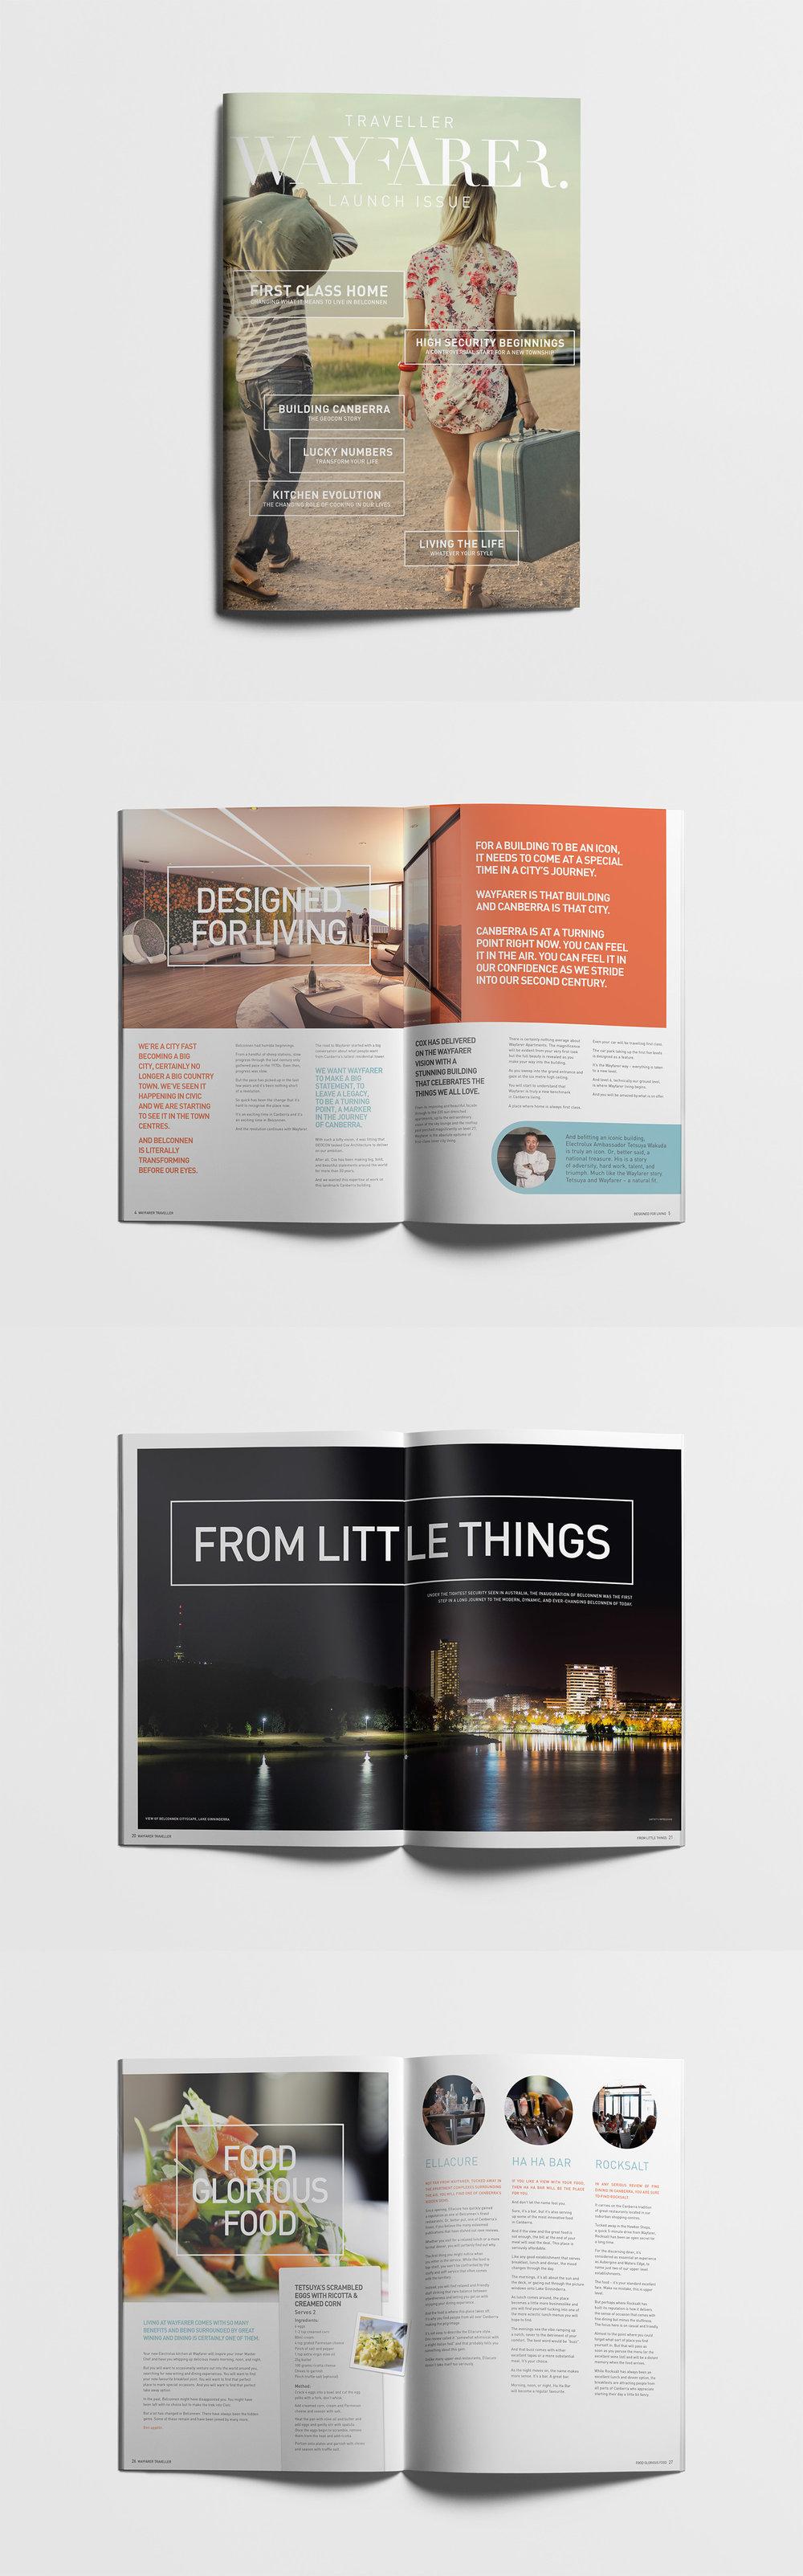 Wayfarer-brochure-cover+spreads-1500.jpg